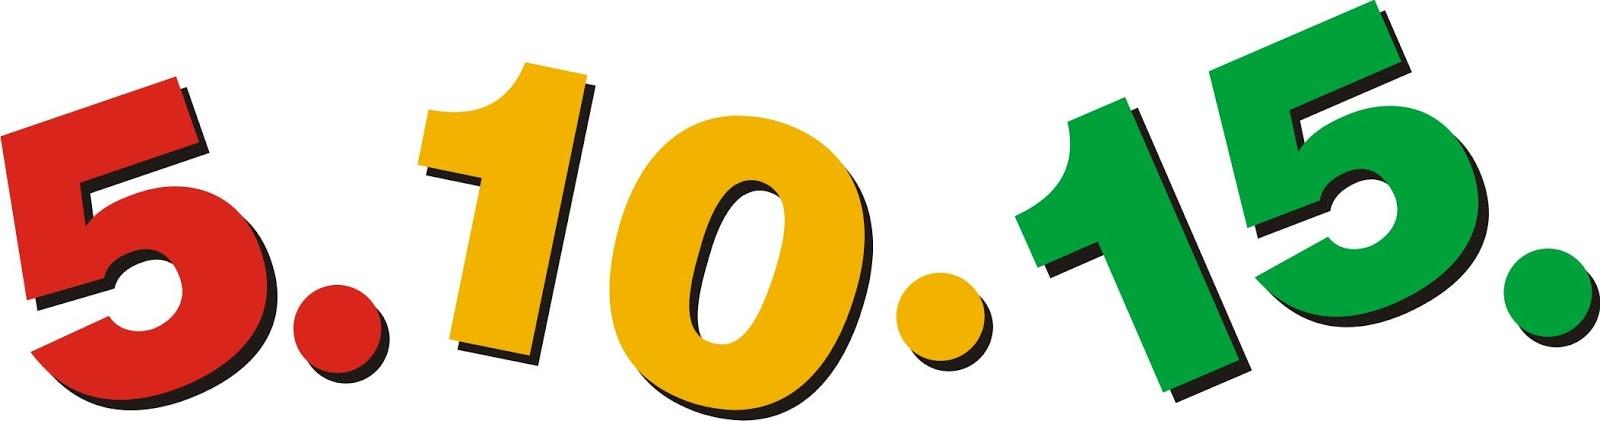 erawtoir.ga Ubranka dla dzieci, odzież dziecięca online - sklep internetowy Search en EUR Choose language: Choose currency: EUR PLN USD Your account Contact Cart: (0) 0,00 € Check out BABY 0 - 2 yrs TODDLER GIRL lat Girl 8 - 12 yrs Toddler boy 2 - 7 yrs Boy 8 - 12 yrs Toys 0 - 12 yrs SALE 0 Categories Feeding Bedding/Tow.